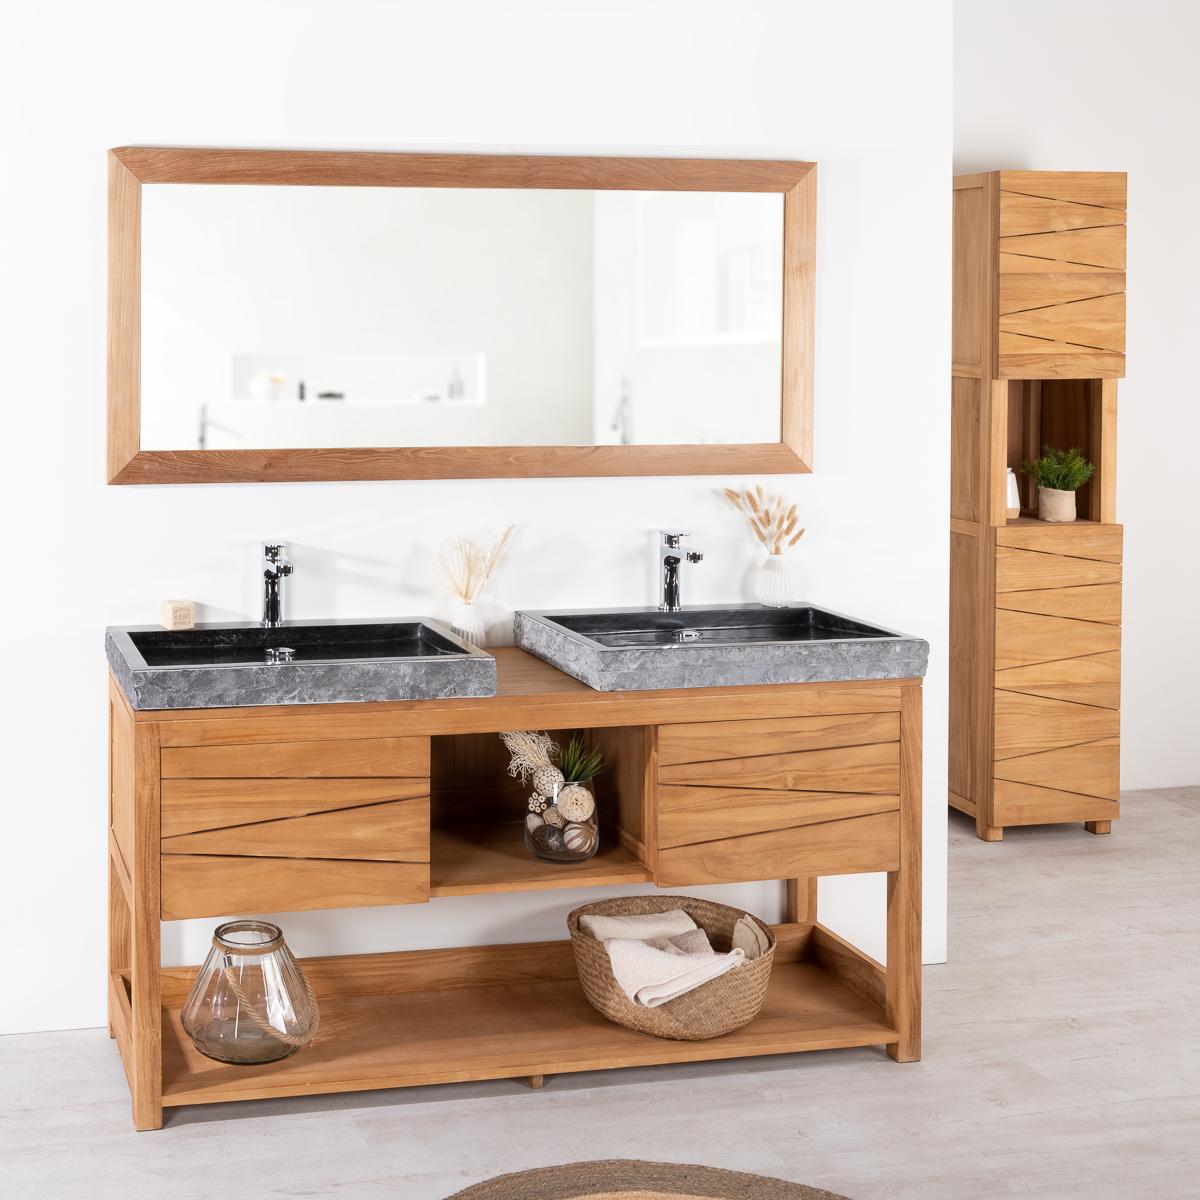 vasque en teck massif Meuble sous vasque en teck double Cosy .